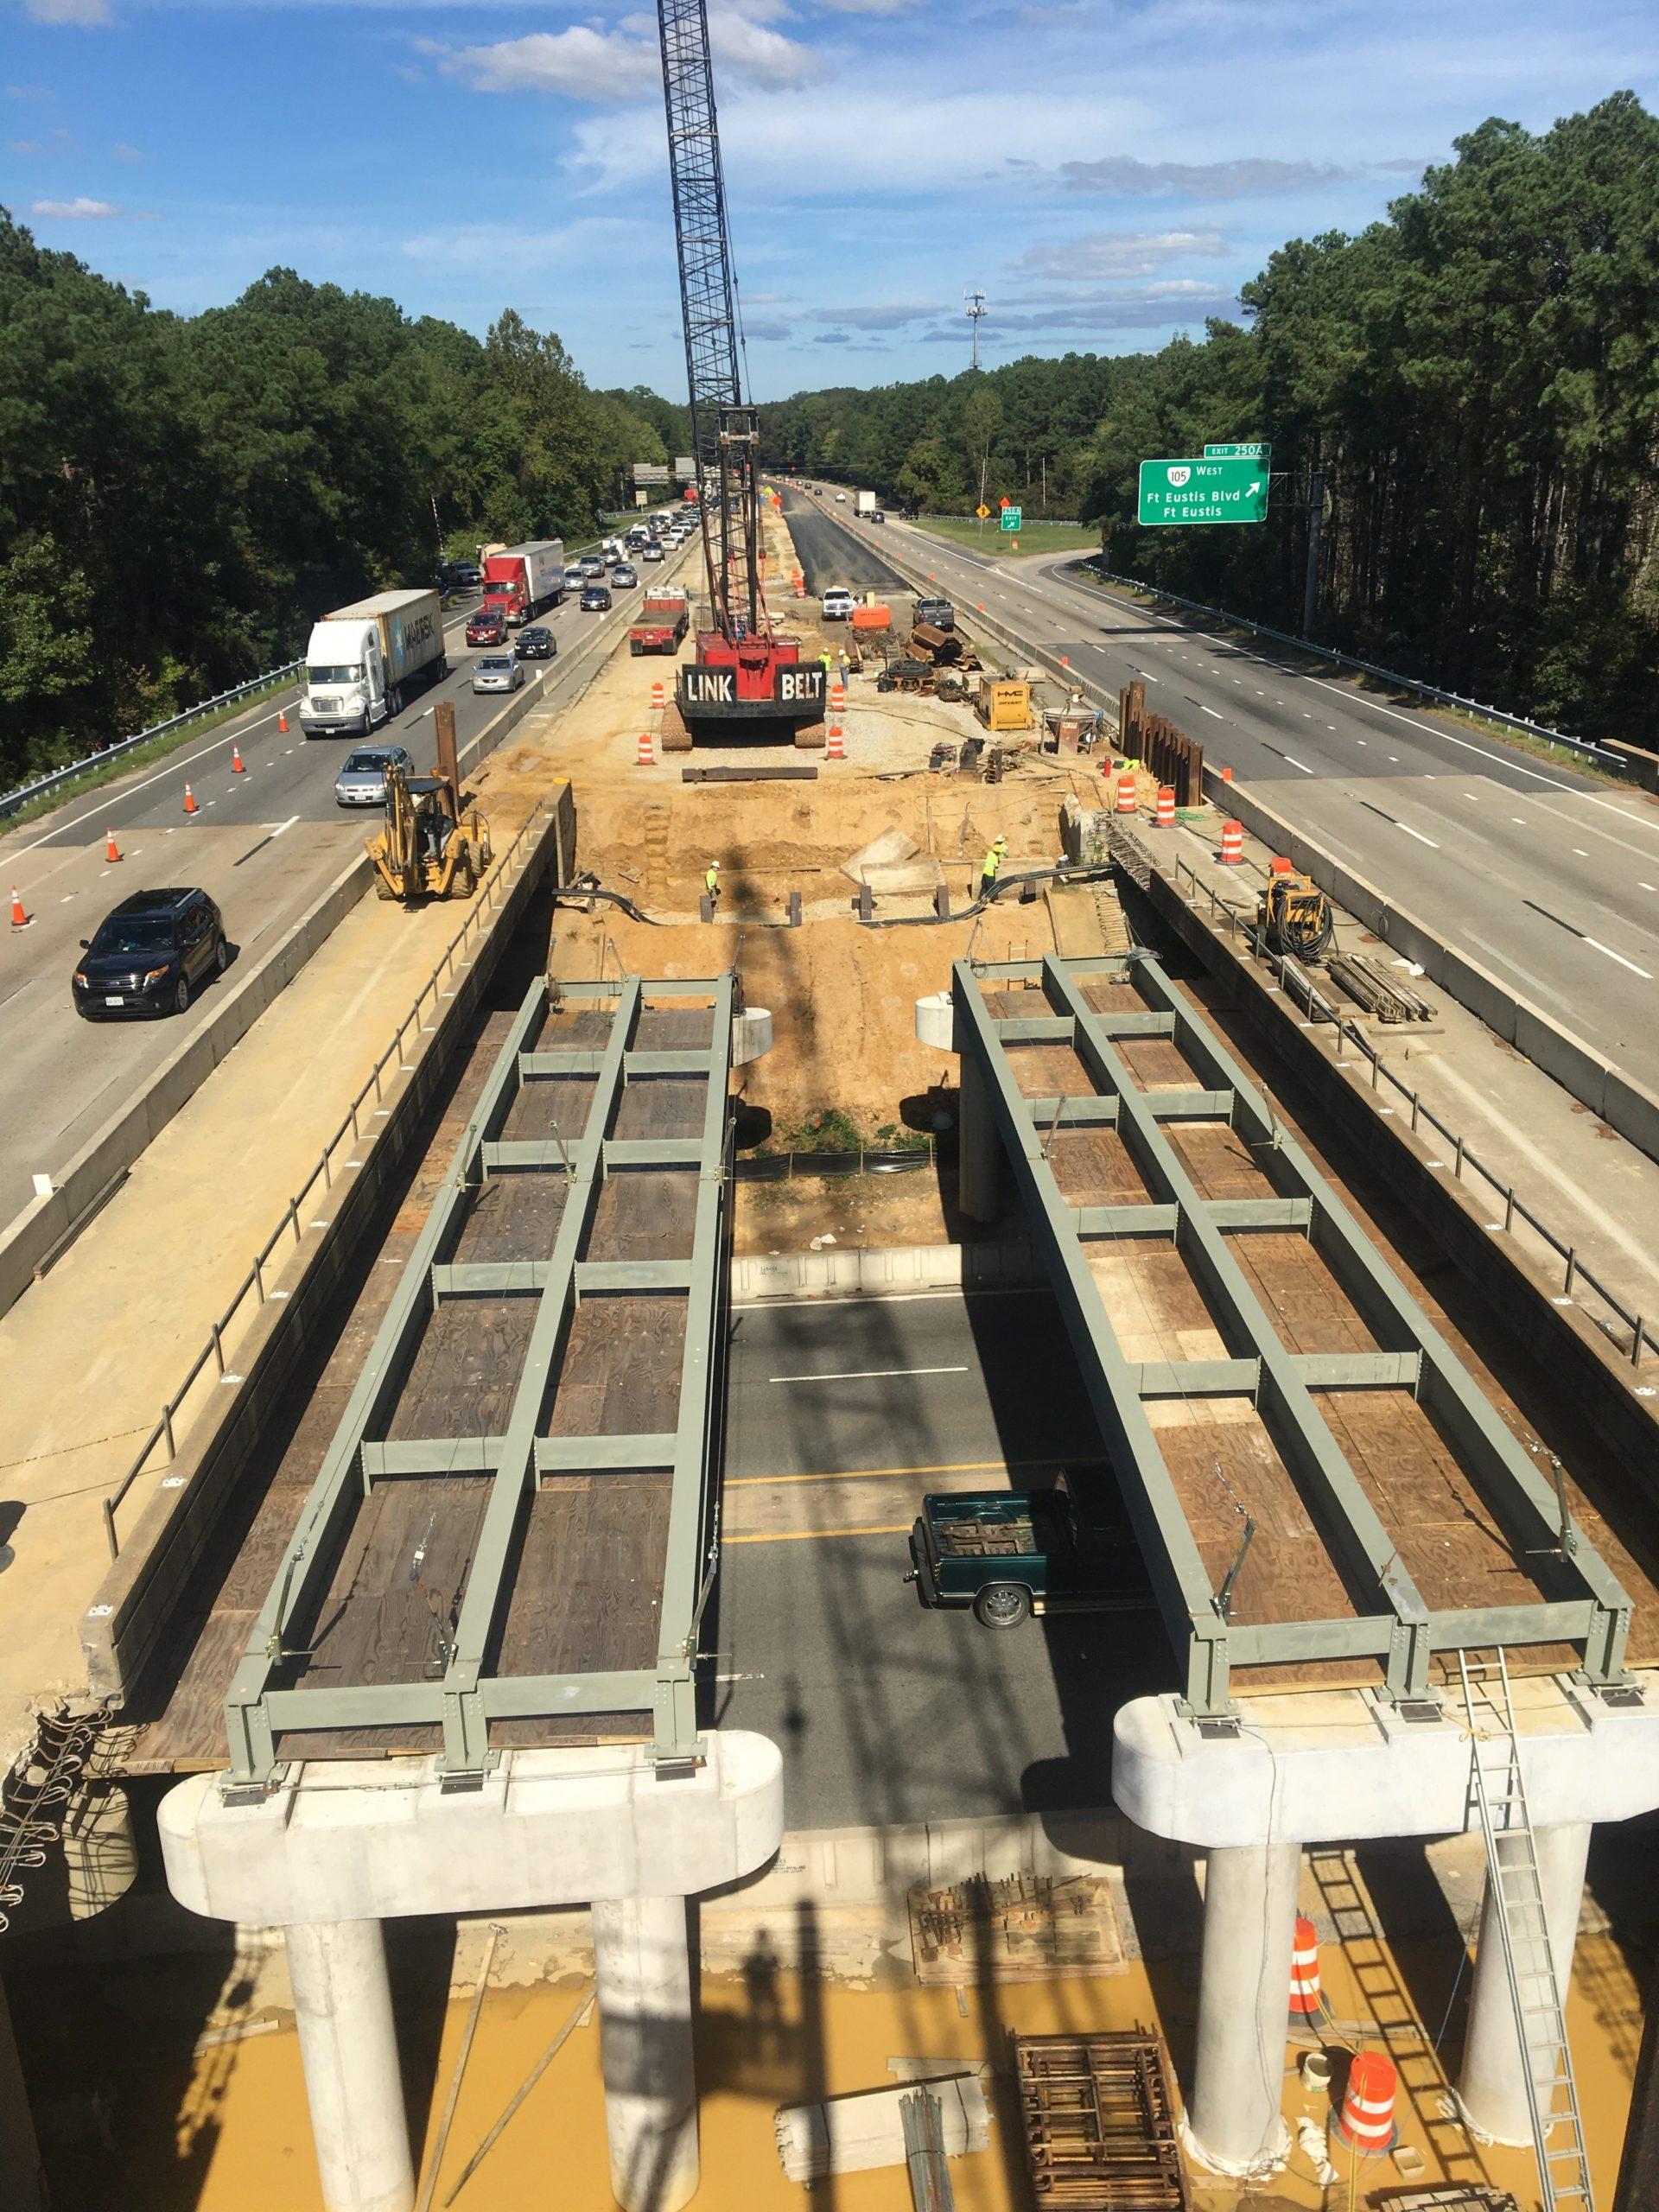 I-64 over Ft. Eustis Blvd.-Newport News, VA: Widening of the existing bridges for the I-64 Capacity Improvements-Segment I project